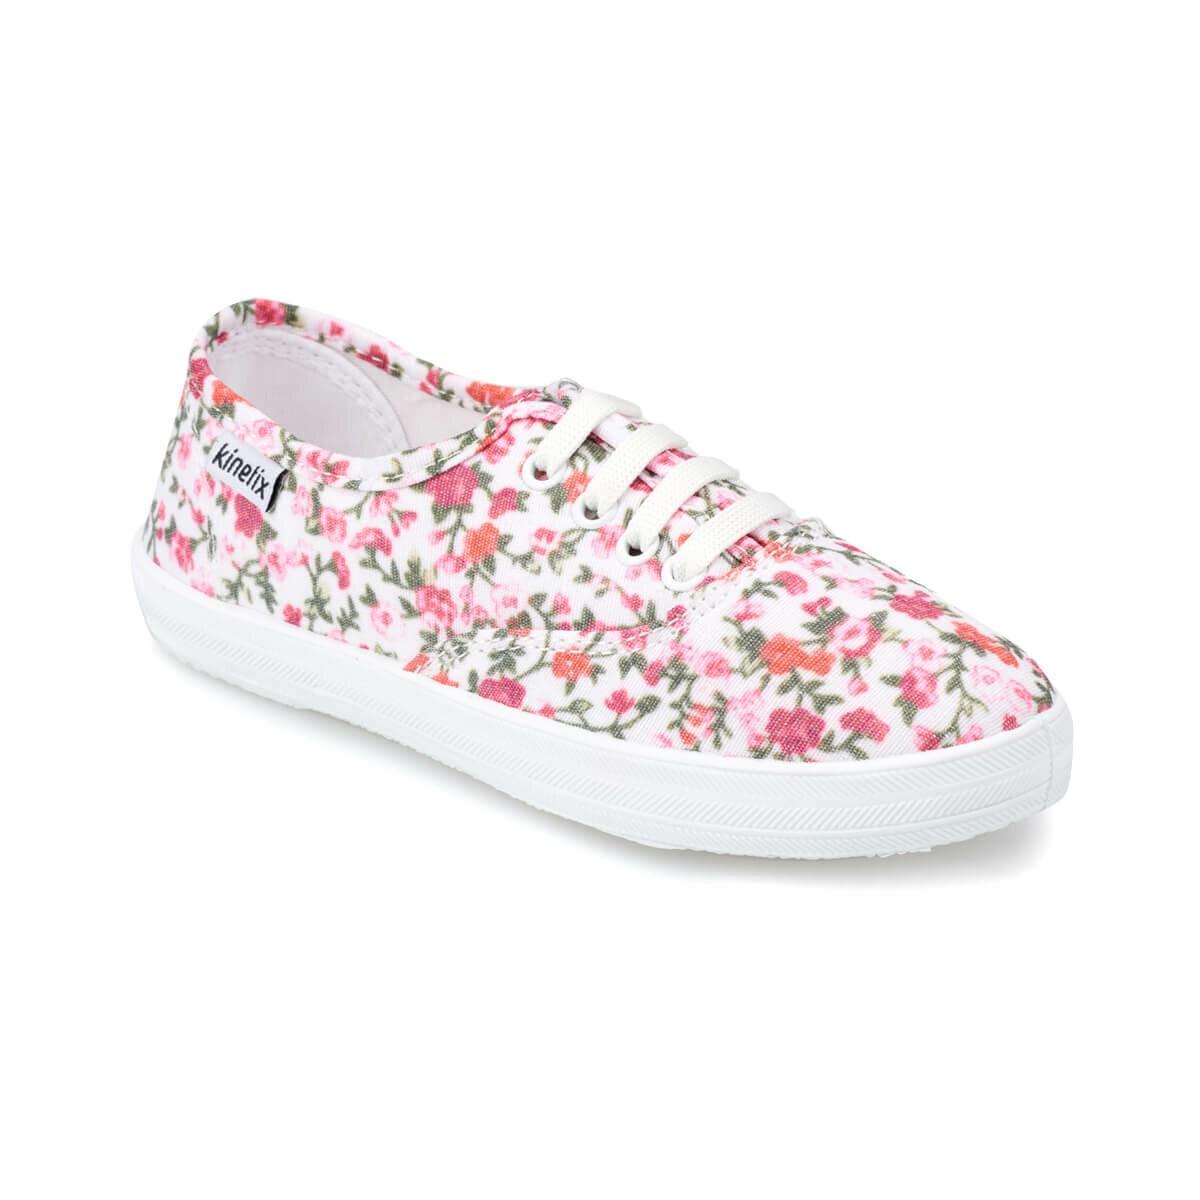 FLO HELEN P Multicolour Female Child Sneaker Shoes KINETIX